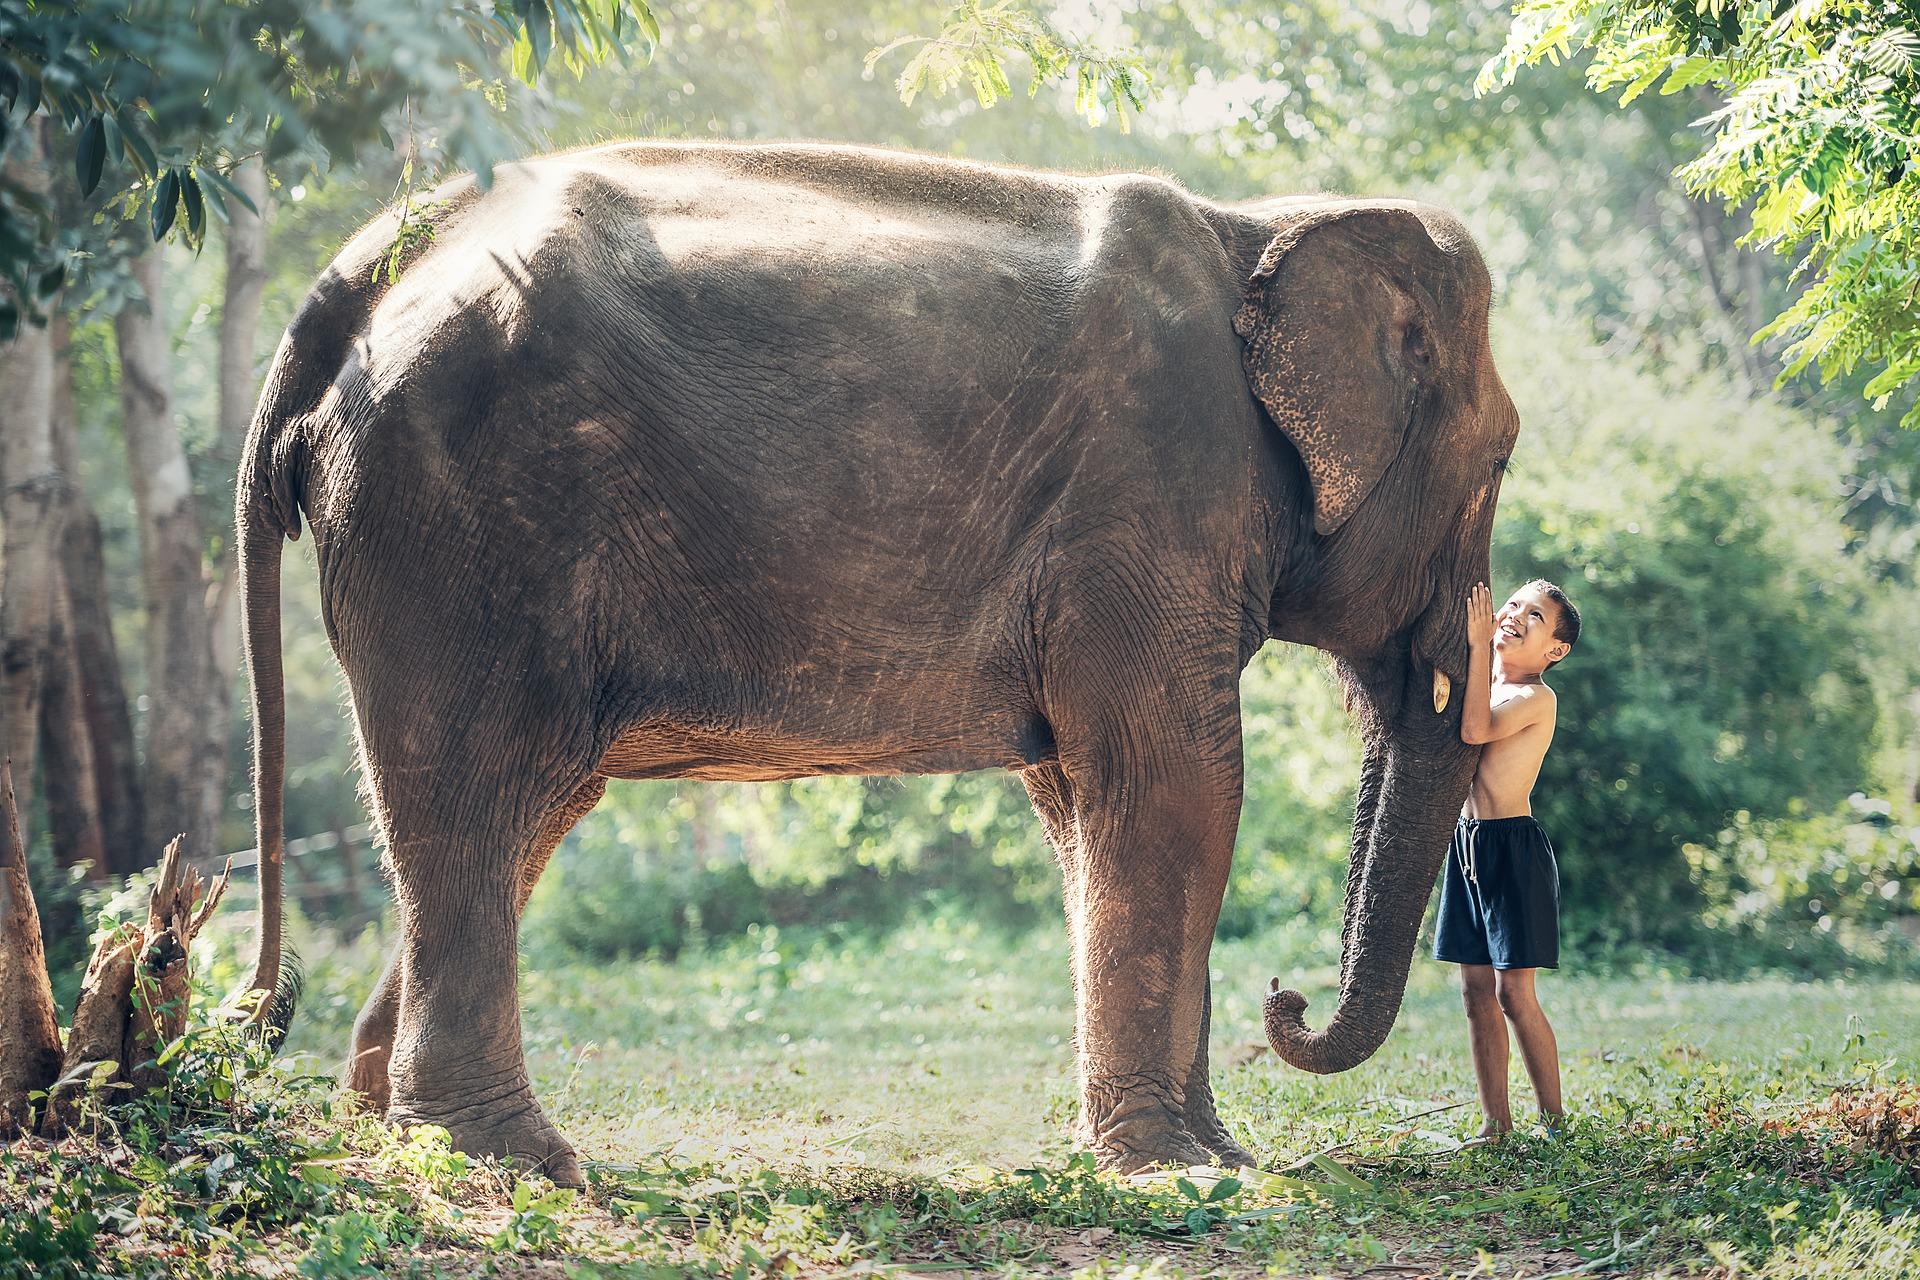 elephant-1822492_1920.jpg